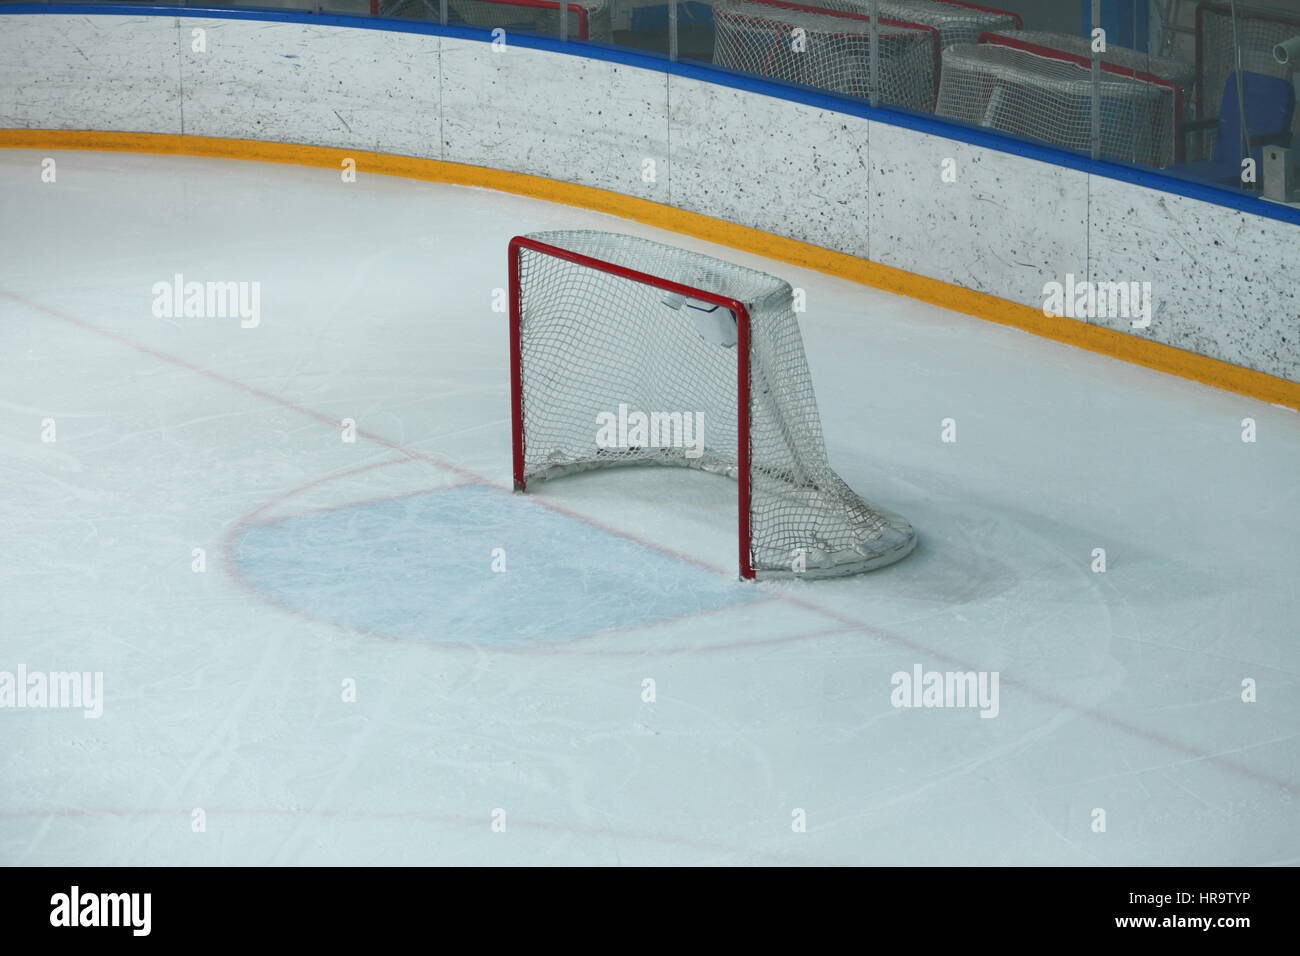 Empty hockey gate before the a hockey match - Stock Image